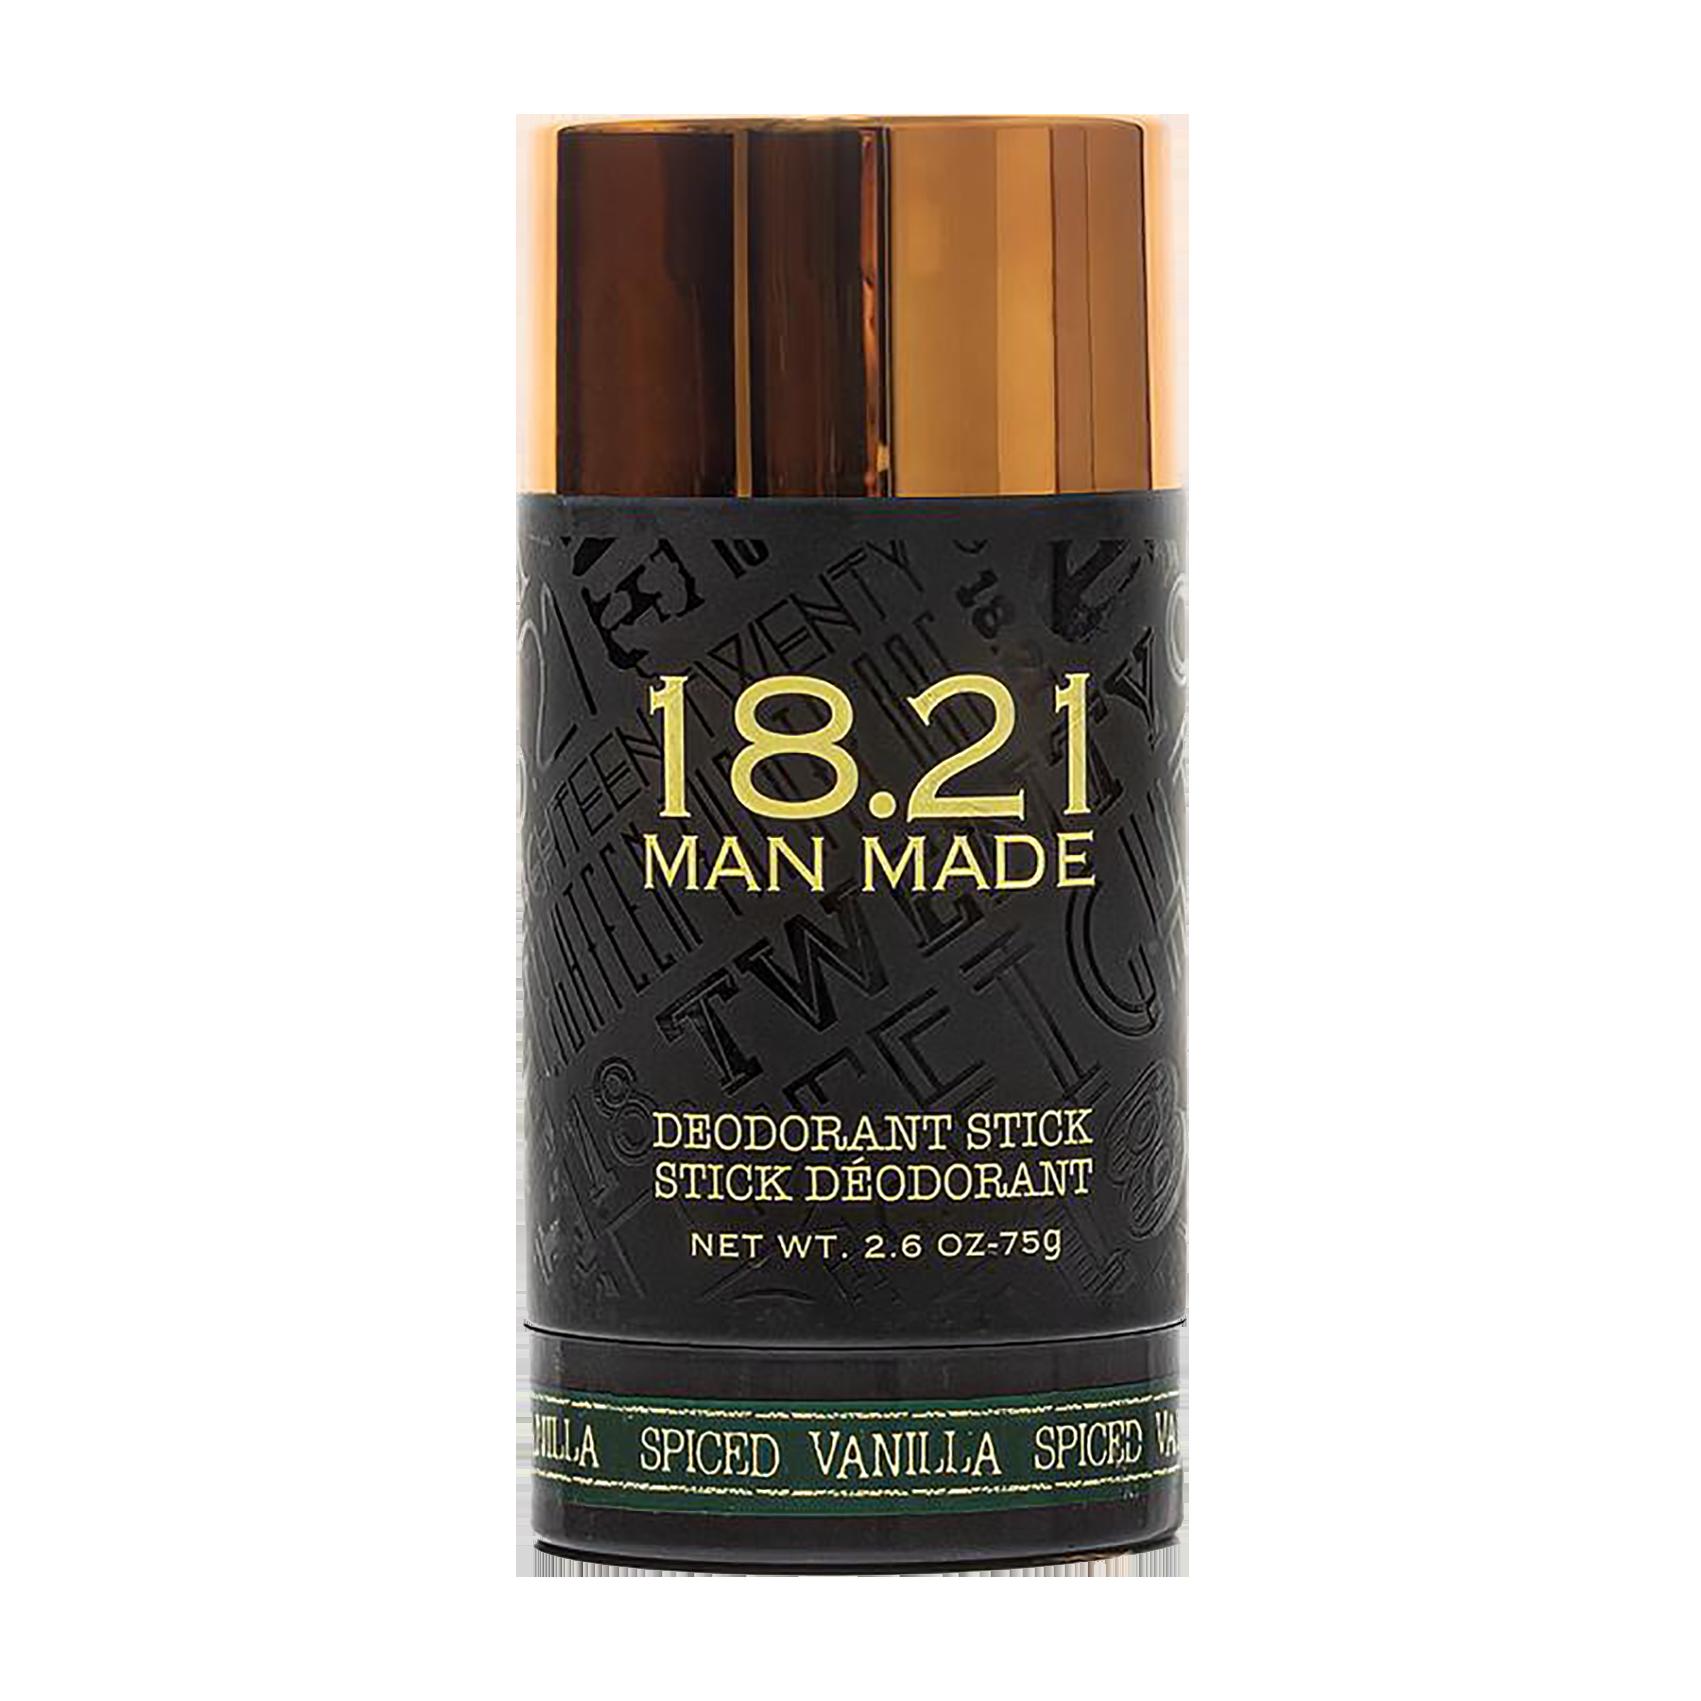 18.21 Deodorant Spiced Vanilla